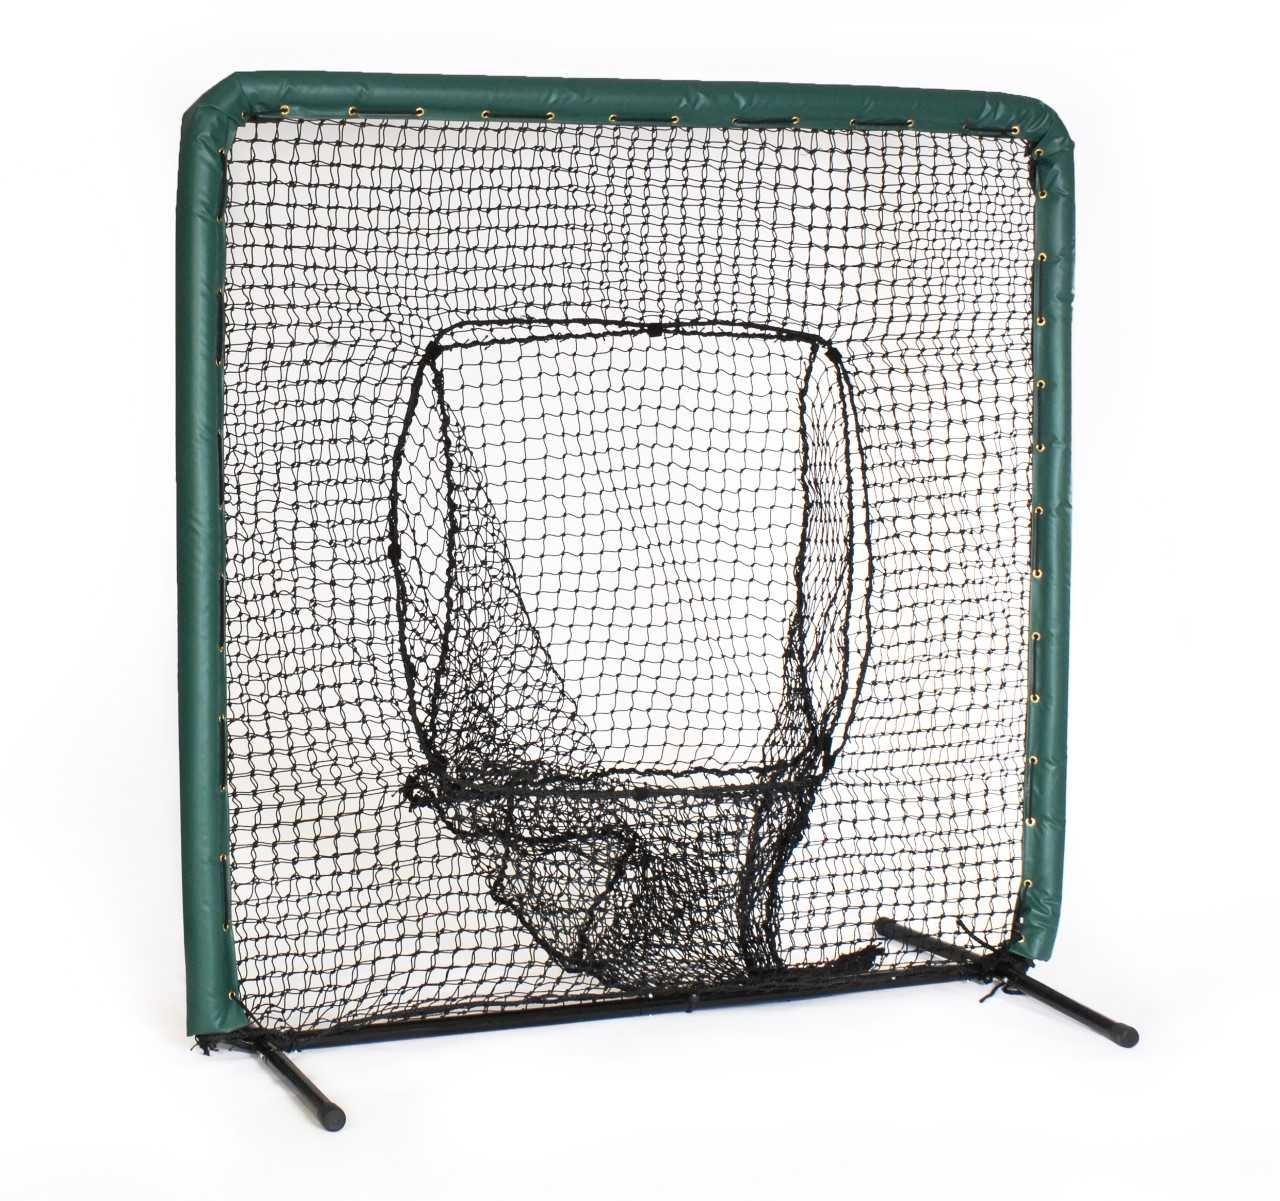 Armor 7X7 Sock Net Baseball//Softball Catch Net Practice//Training Screen with Yellow Padding